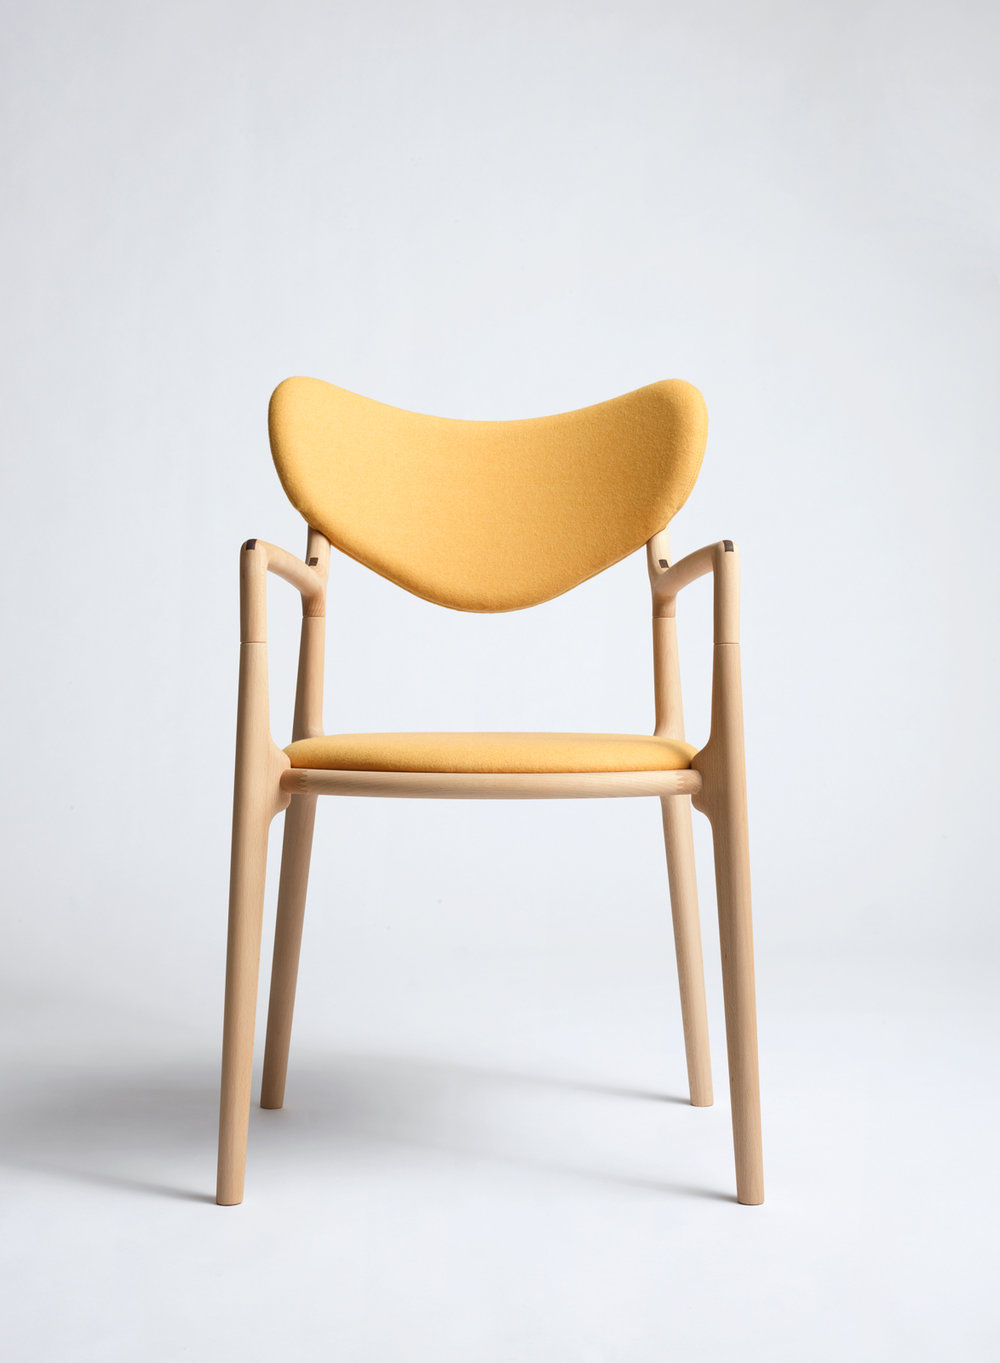 Salon_Chair_Beech_Oil_Camira_Fabric_Asger_Soelberg_01.jpg